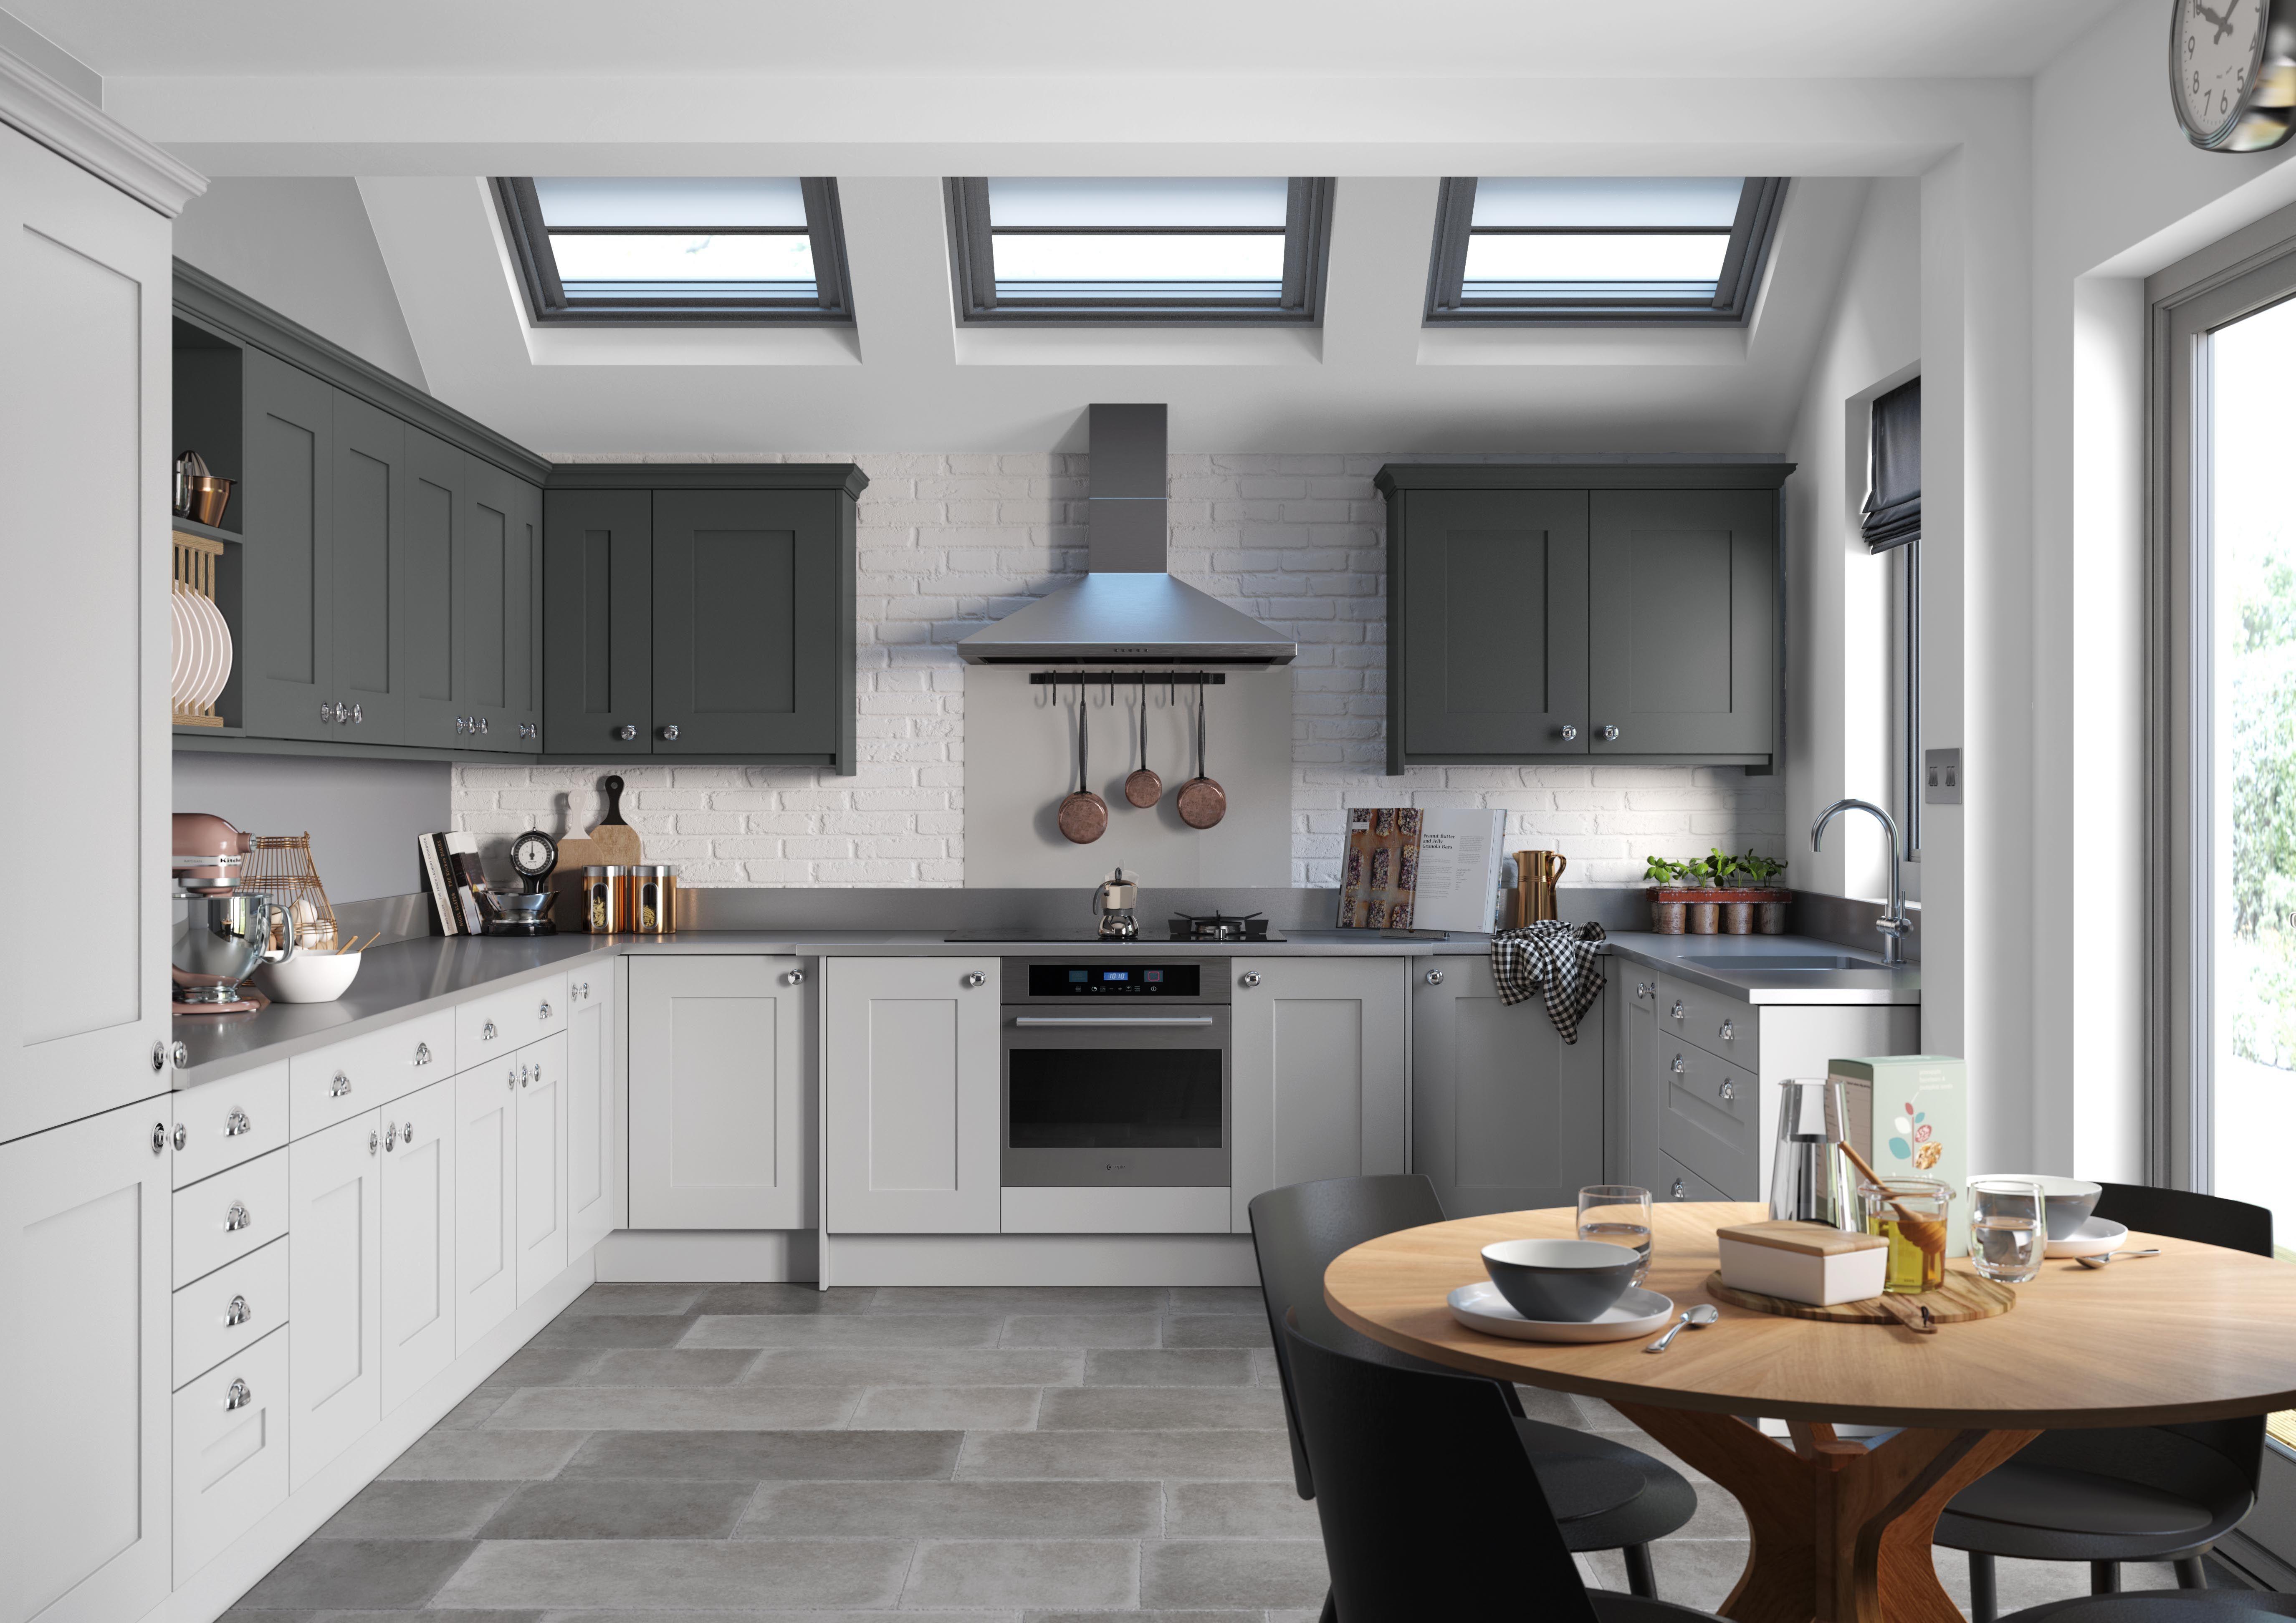 Trend Kitchens Light Grey Plain Shaker and Graphite